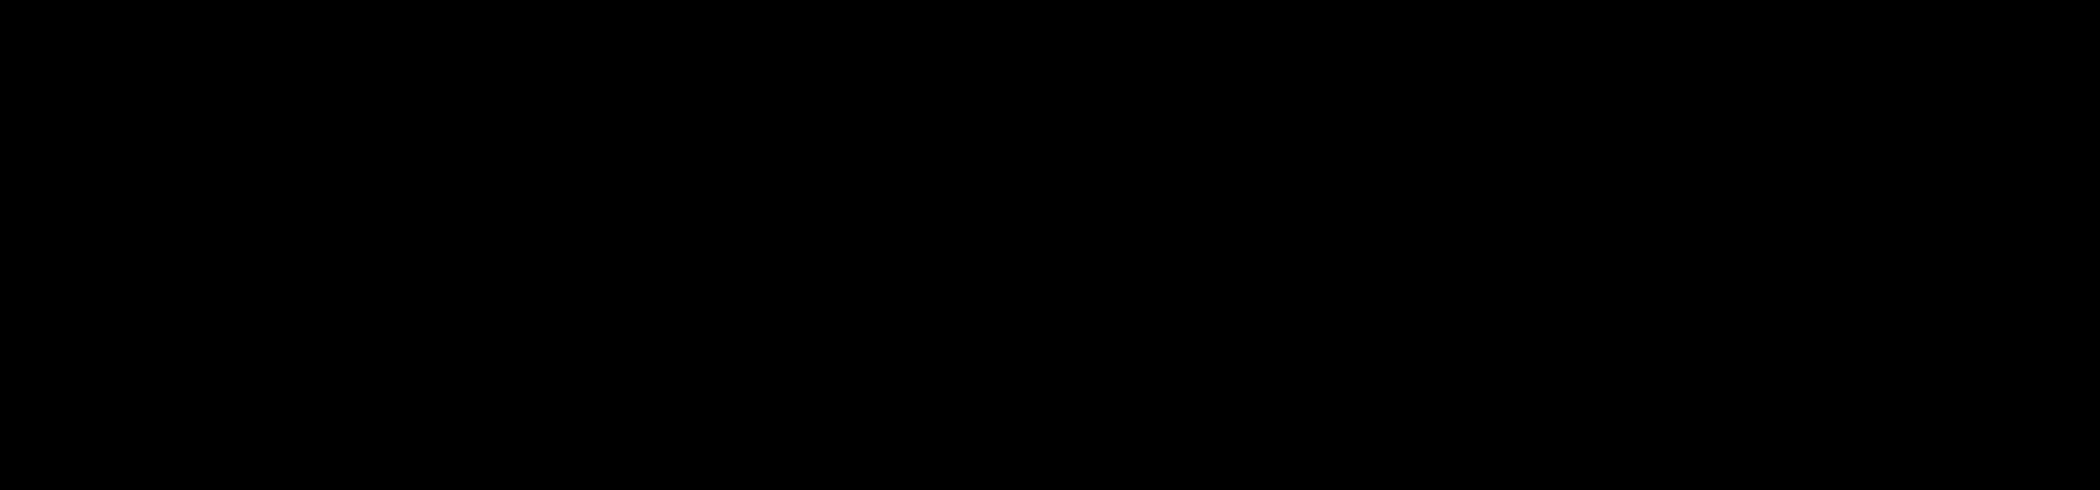 HDMI Logo.